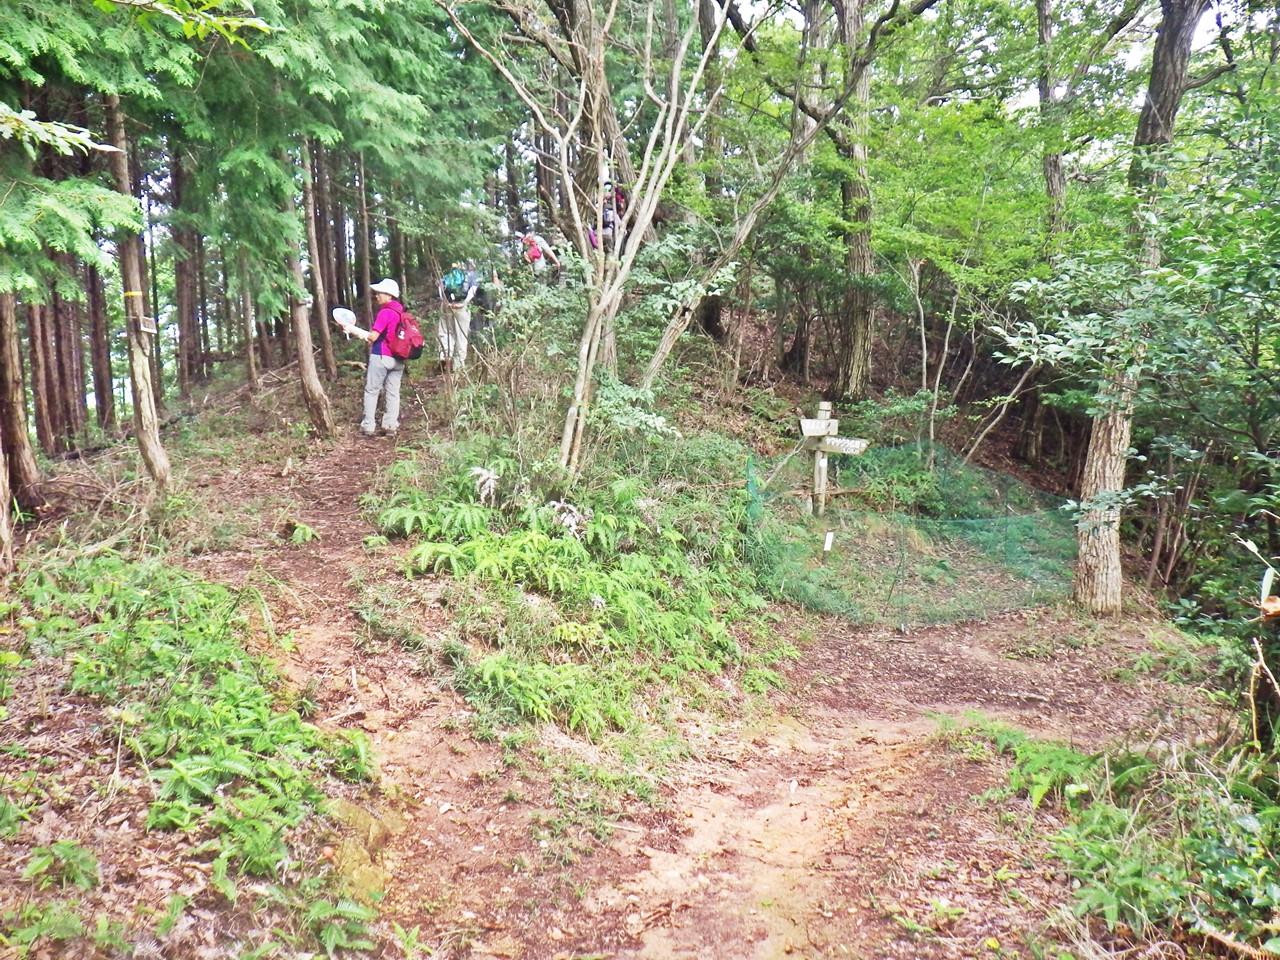 09b 木漏れ日の森への分岐